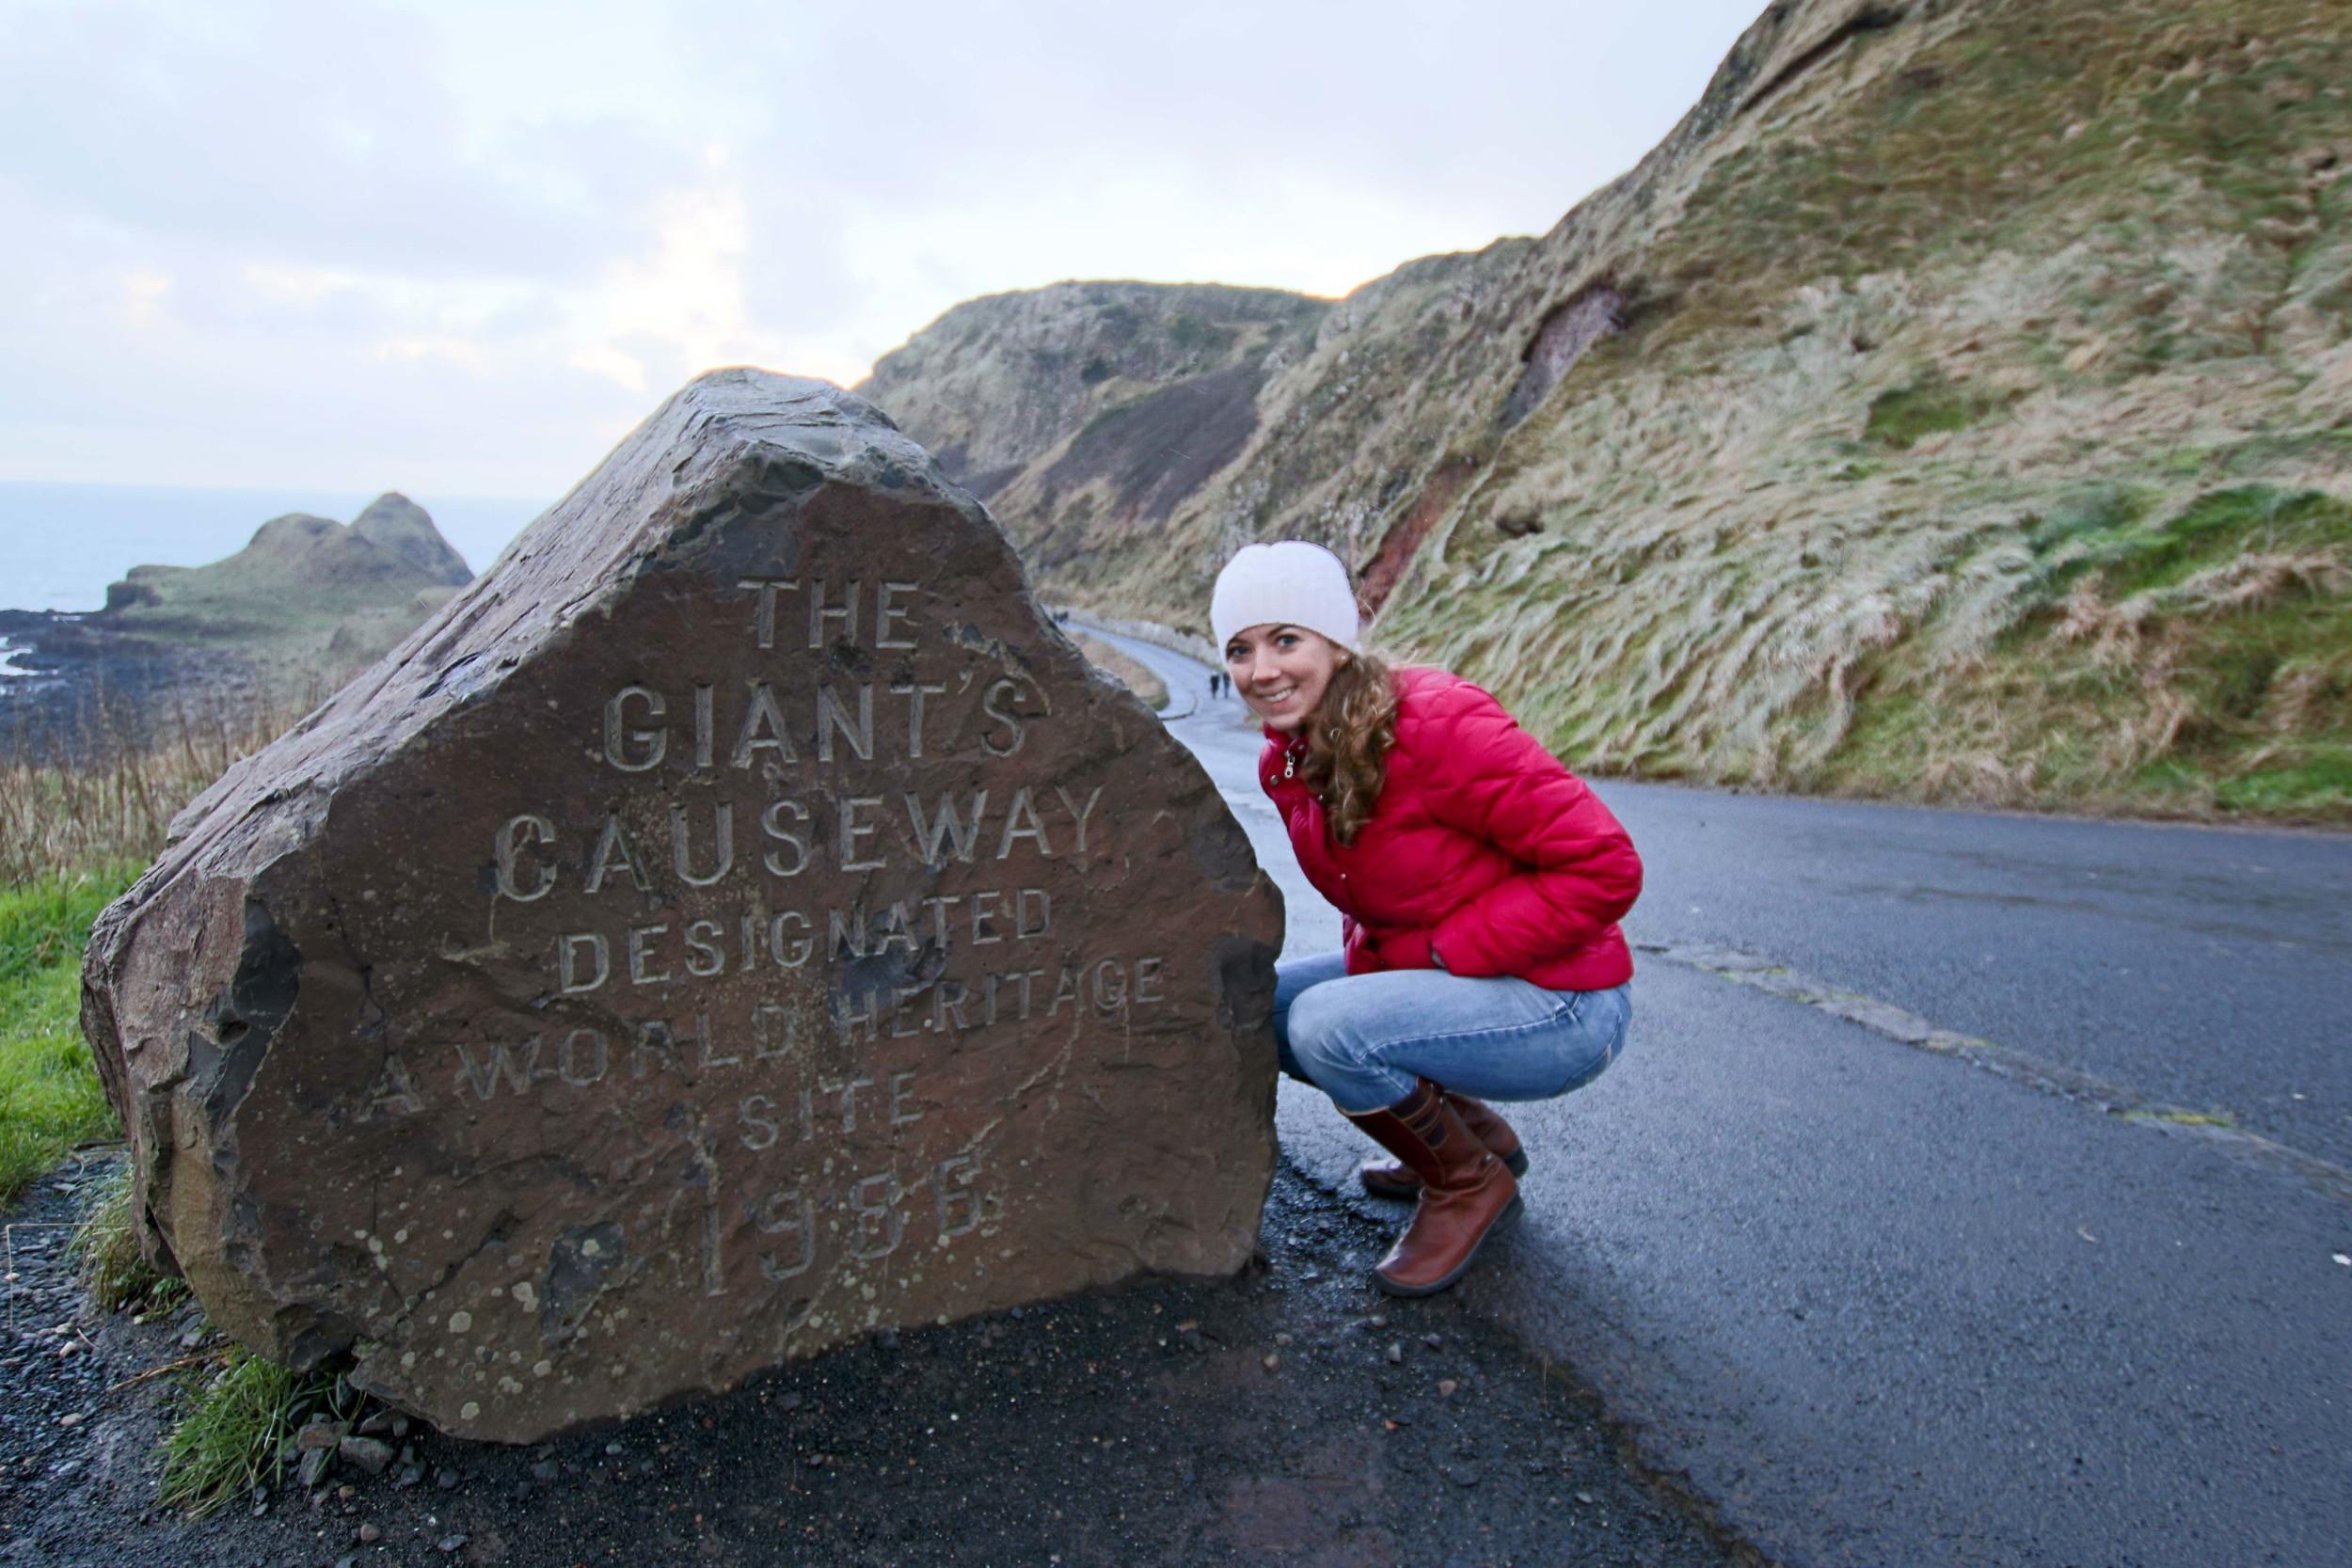 Giant's Causeway!